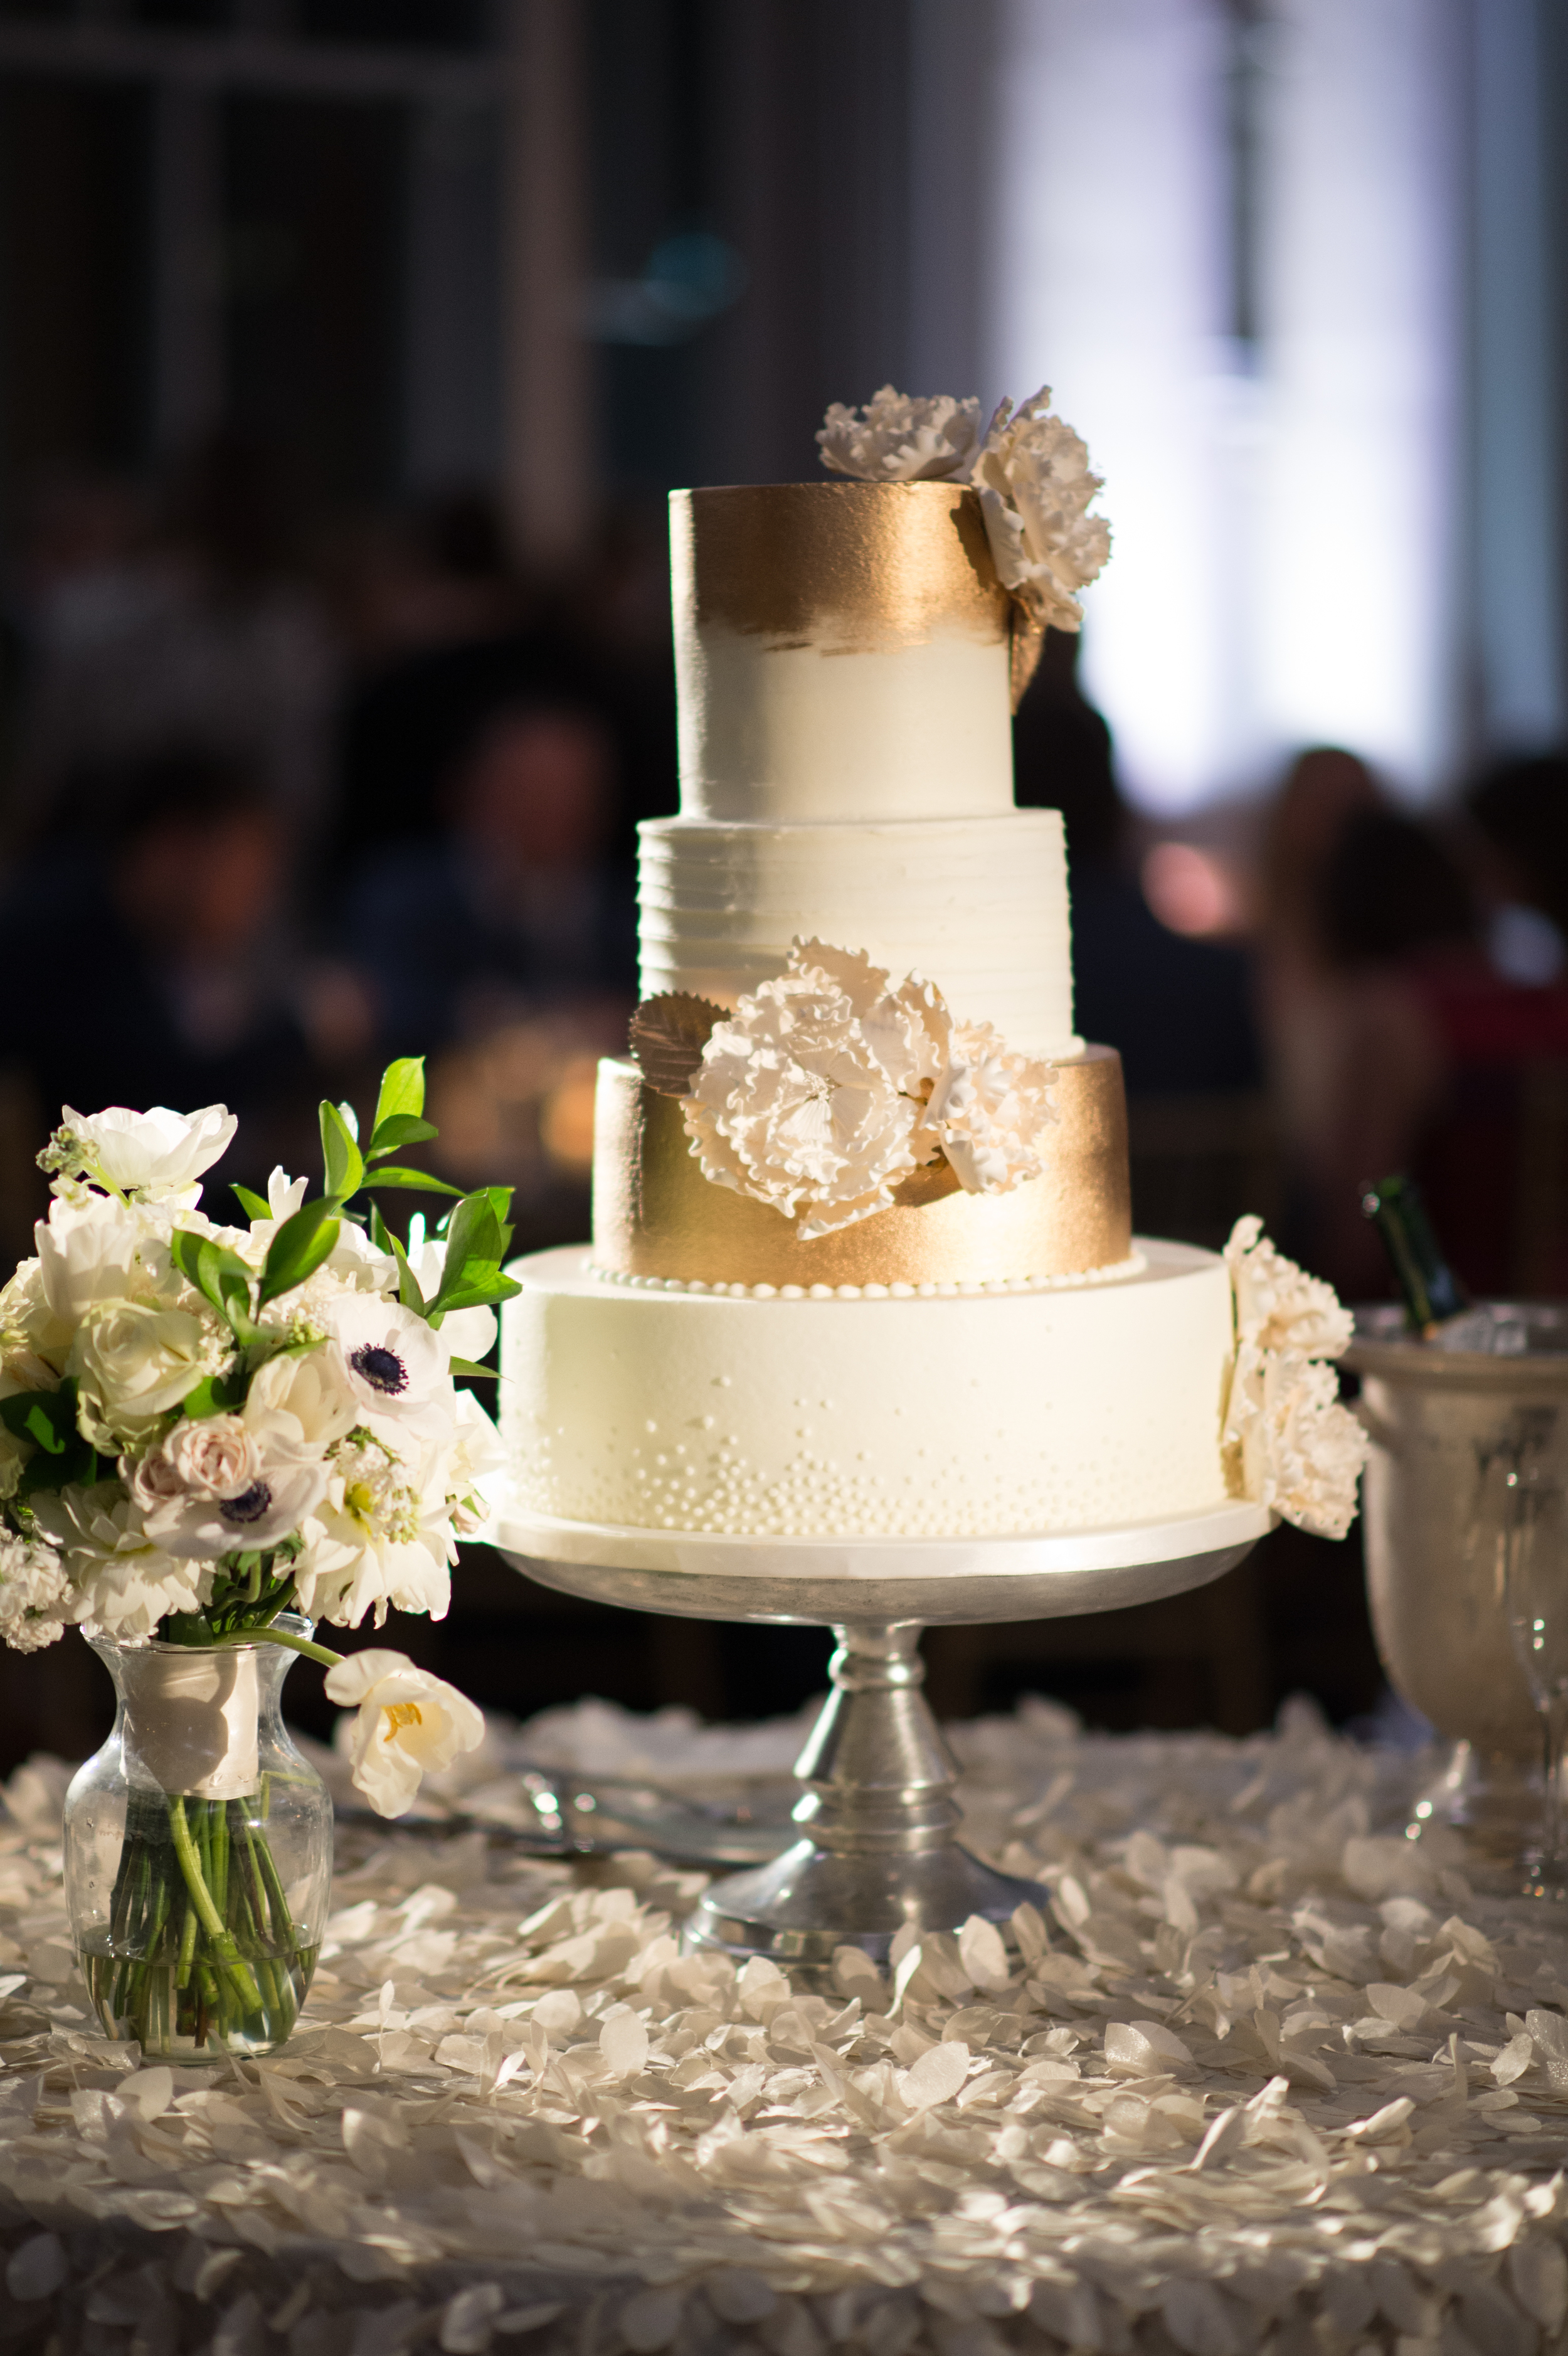 Gold and white wedding cake - eversomething.com